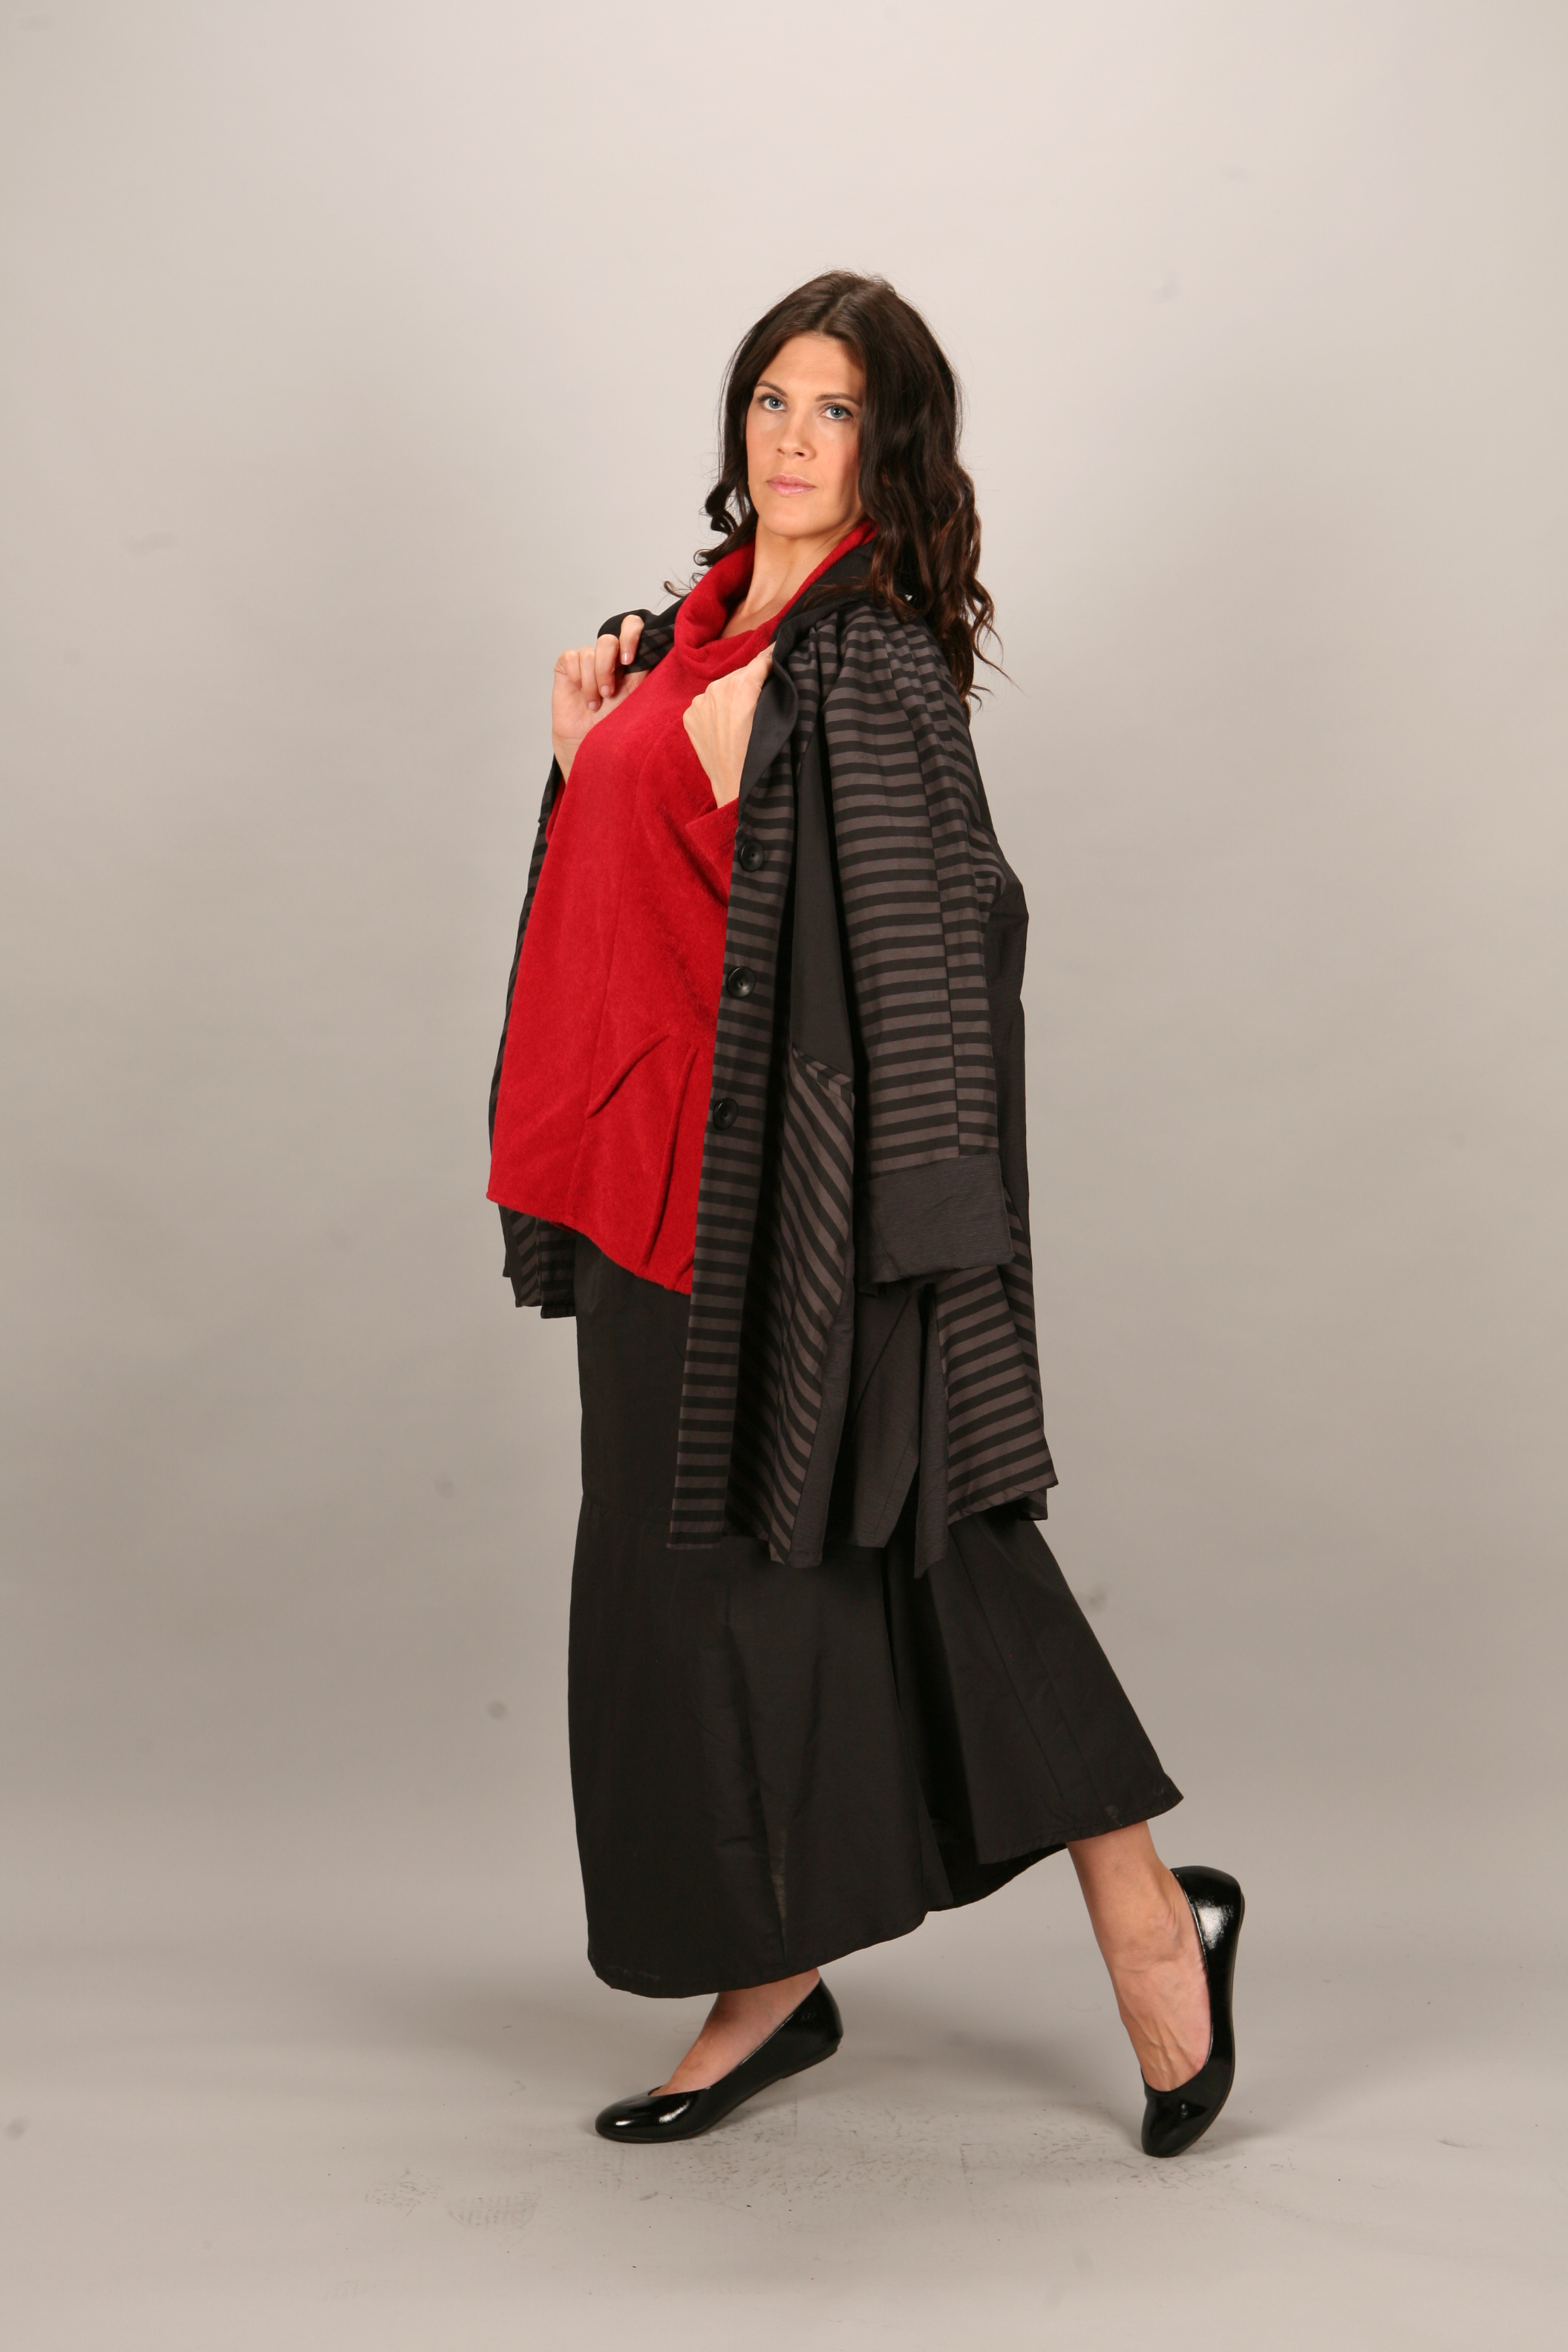 Transparente Designs European Plus Size Fashion